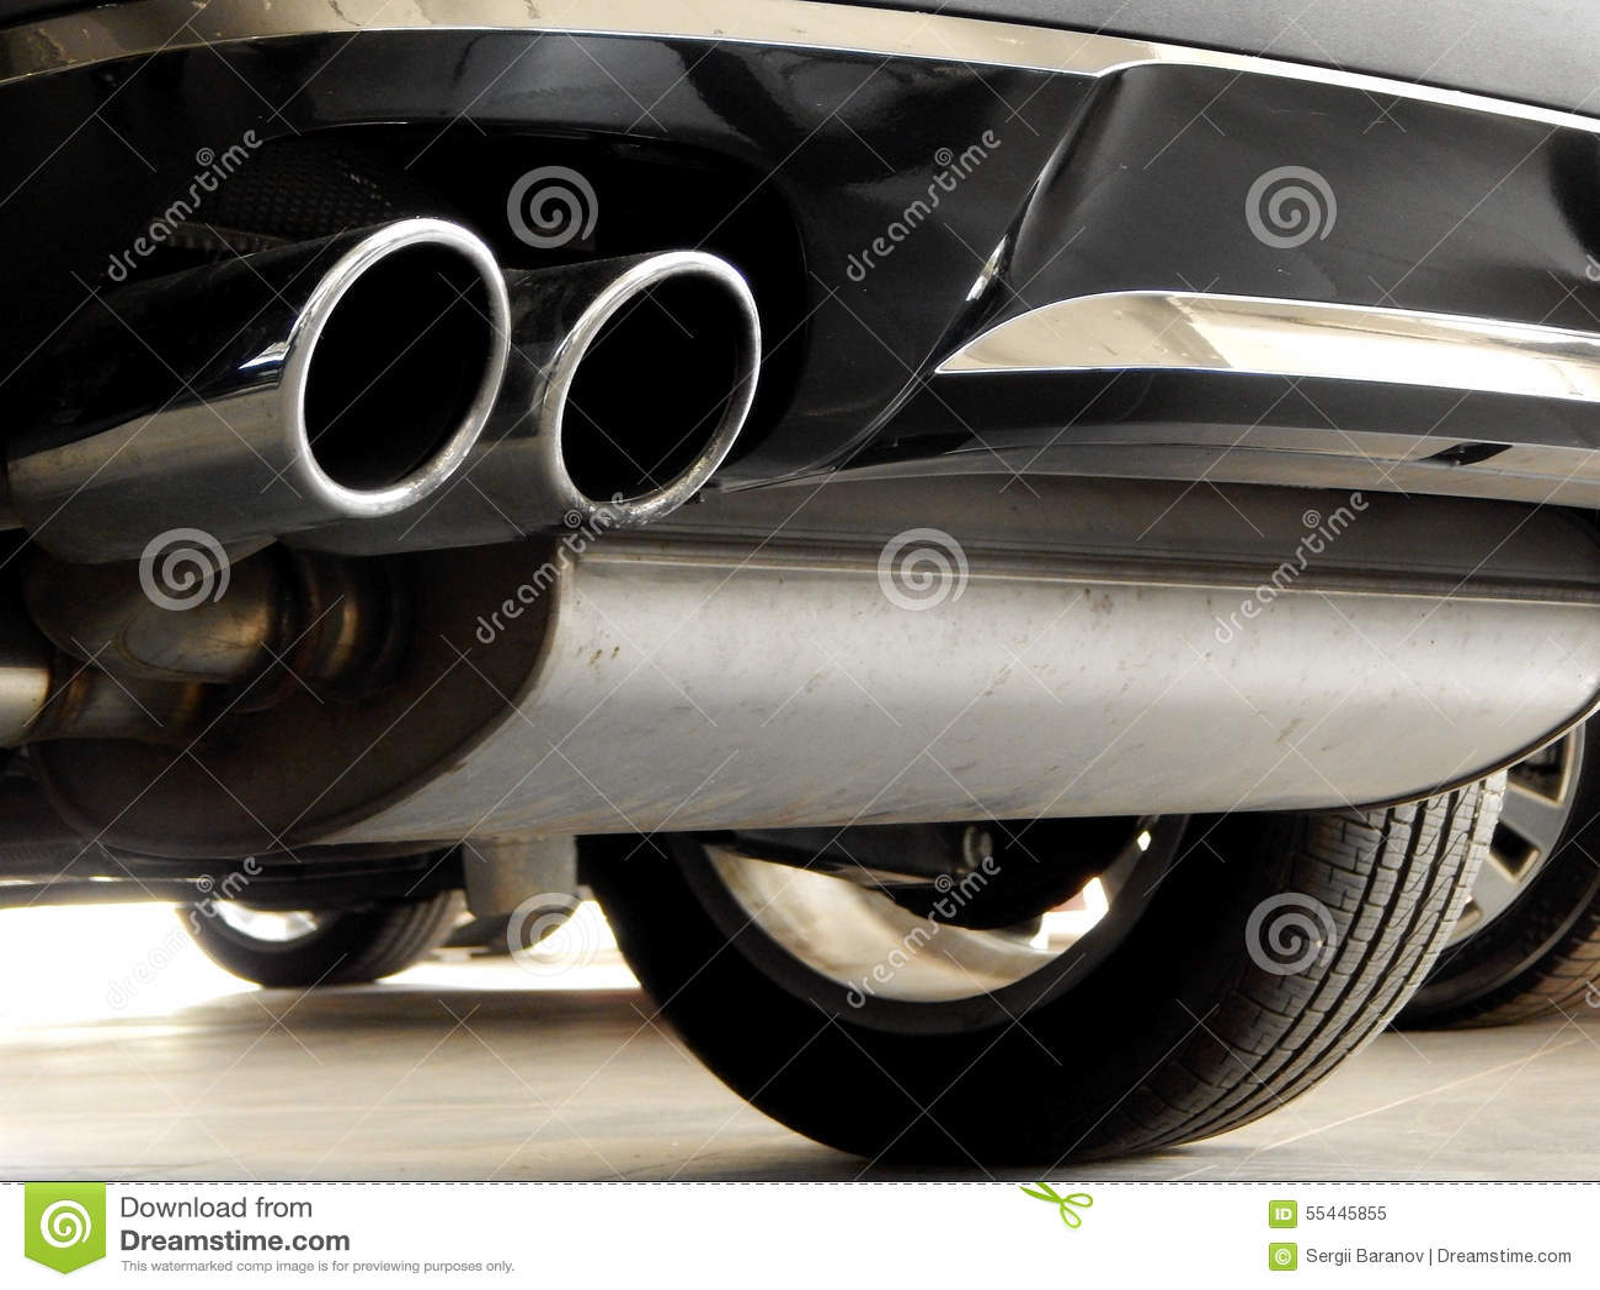 Exhaust Of Car In Car Dealer Shop Closeup Stock Image Image